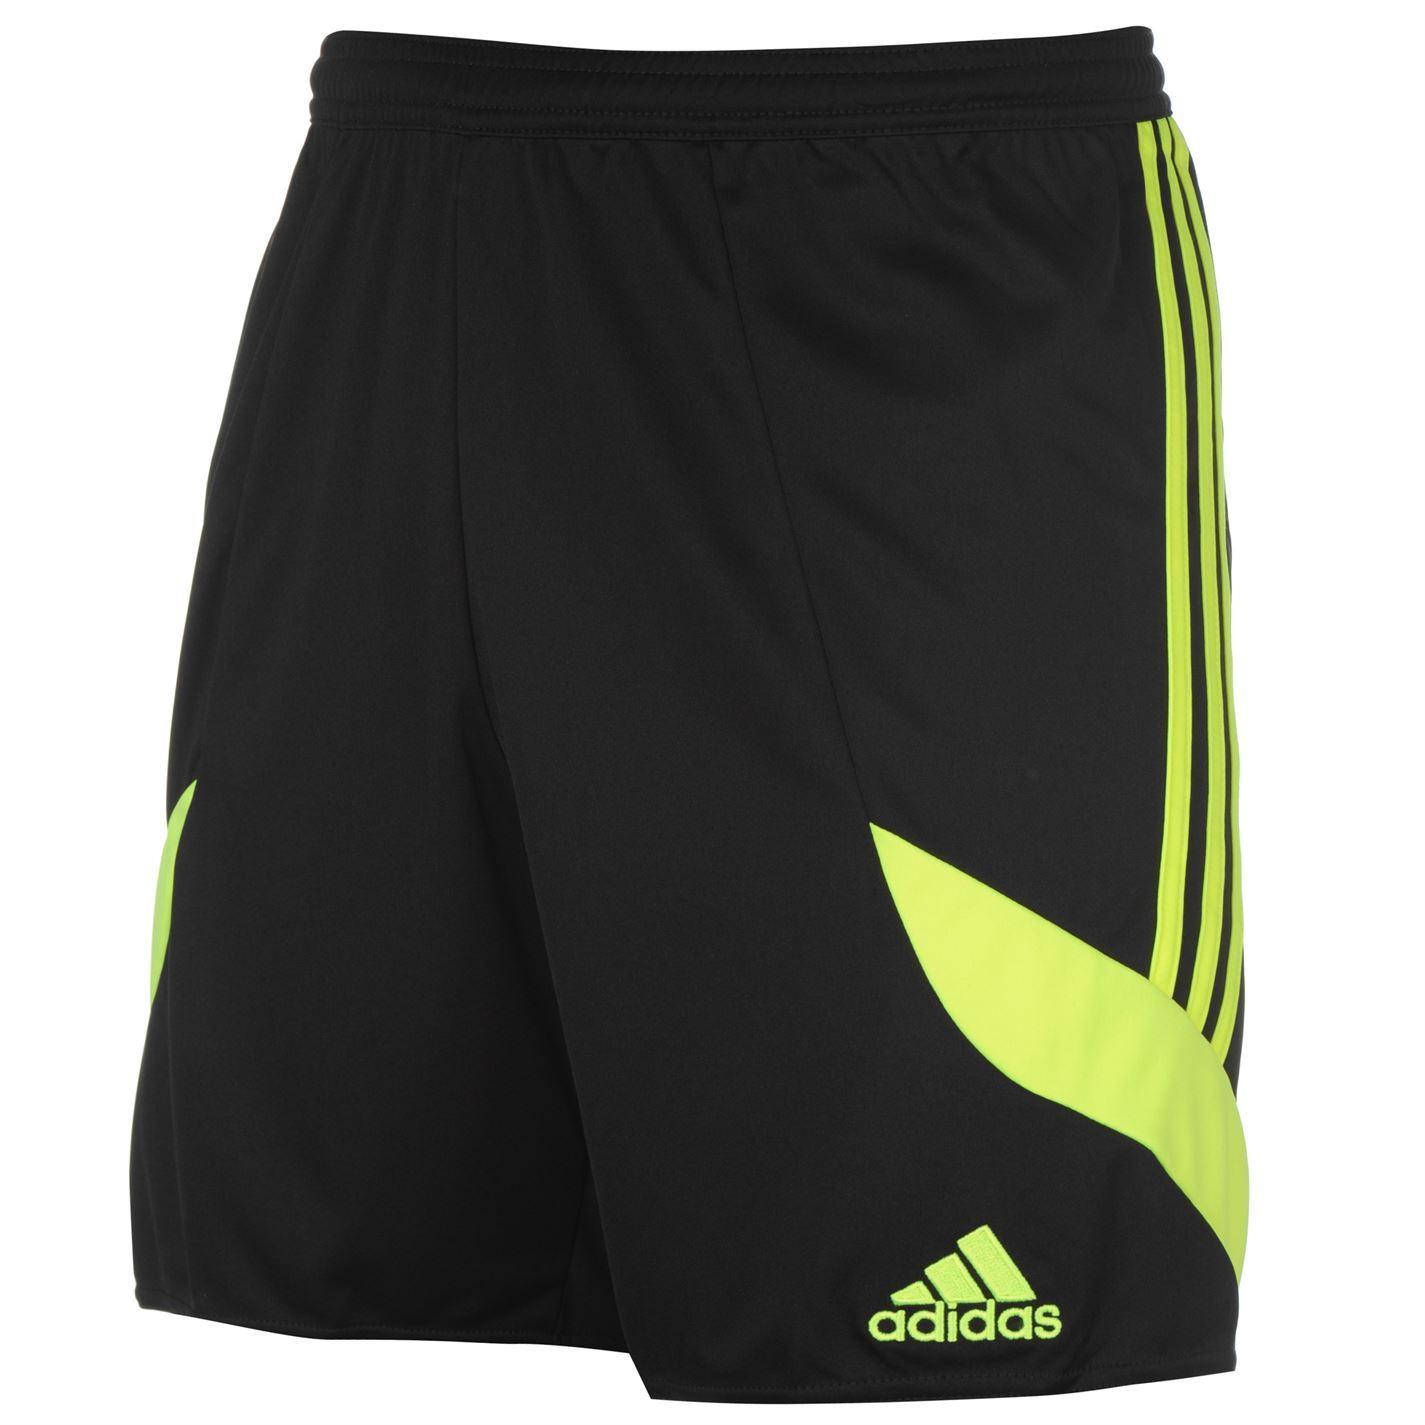 Details Shorts Soccer About Short Football Blackyellow Nova Sportswear Mens Adidas 14 E9IHD2